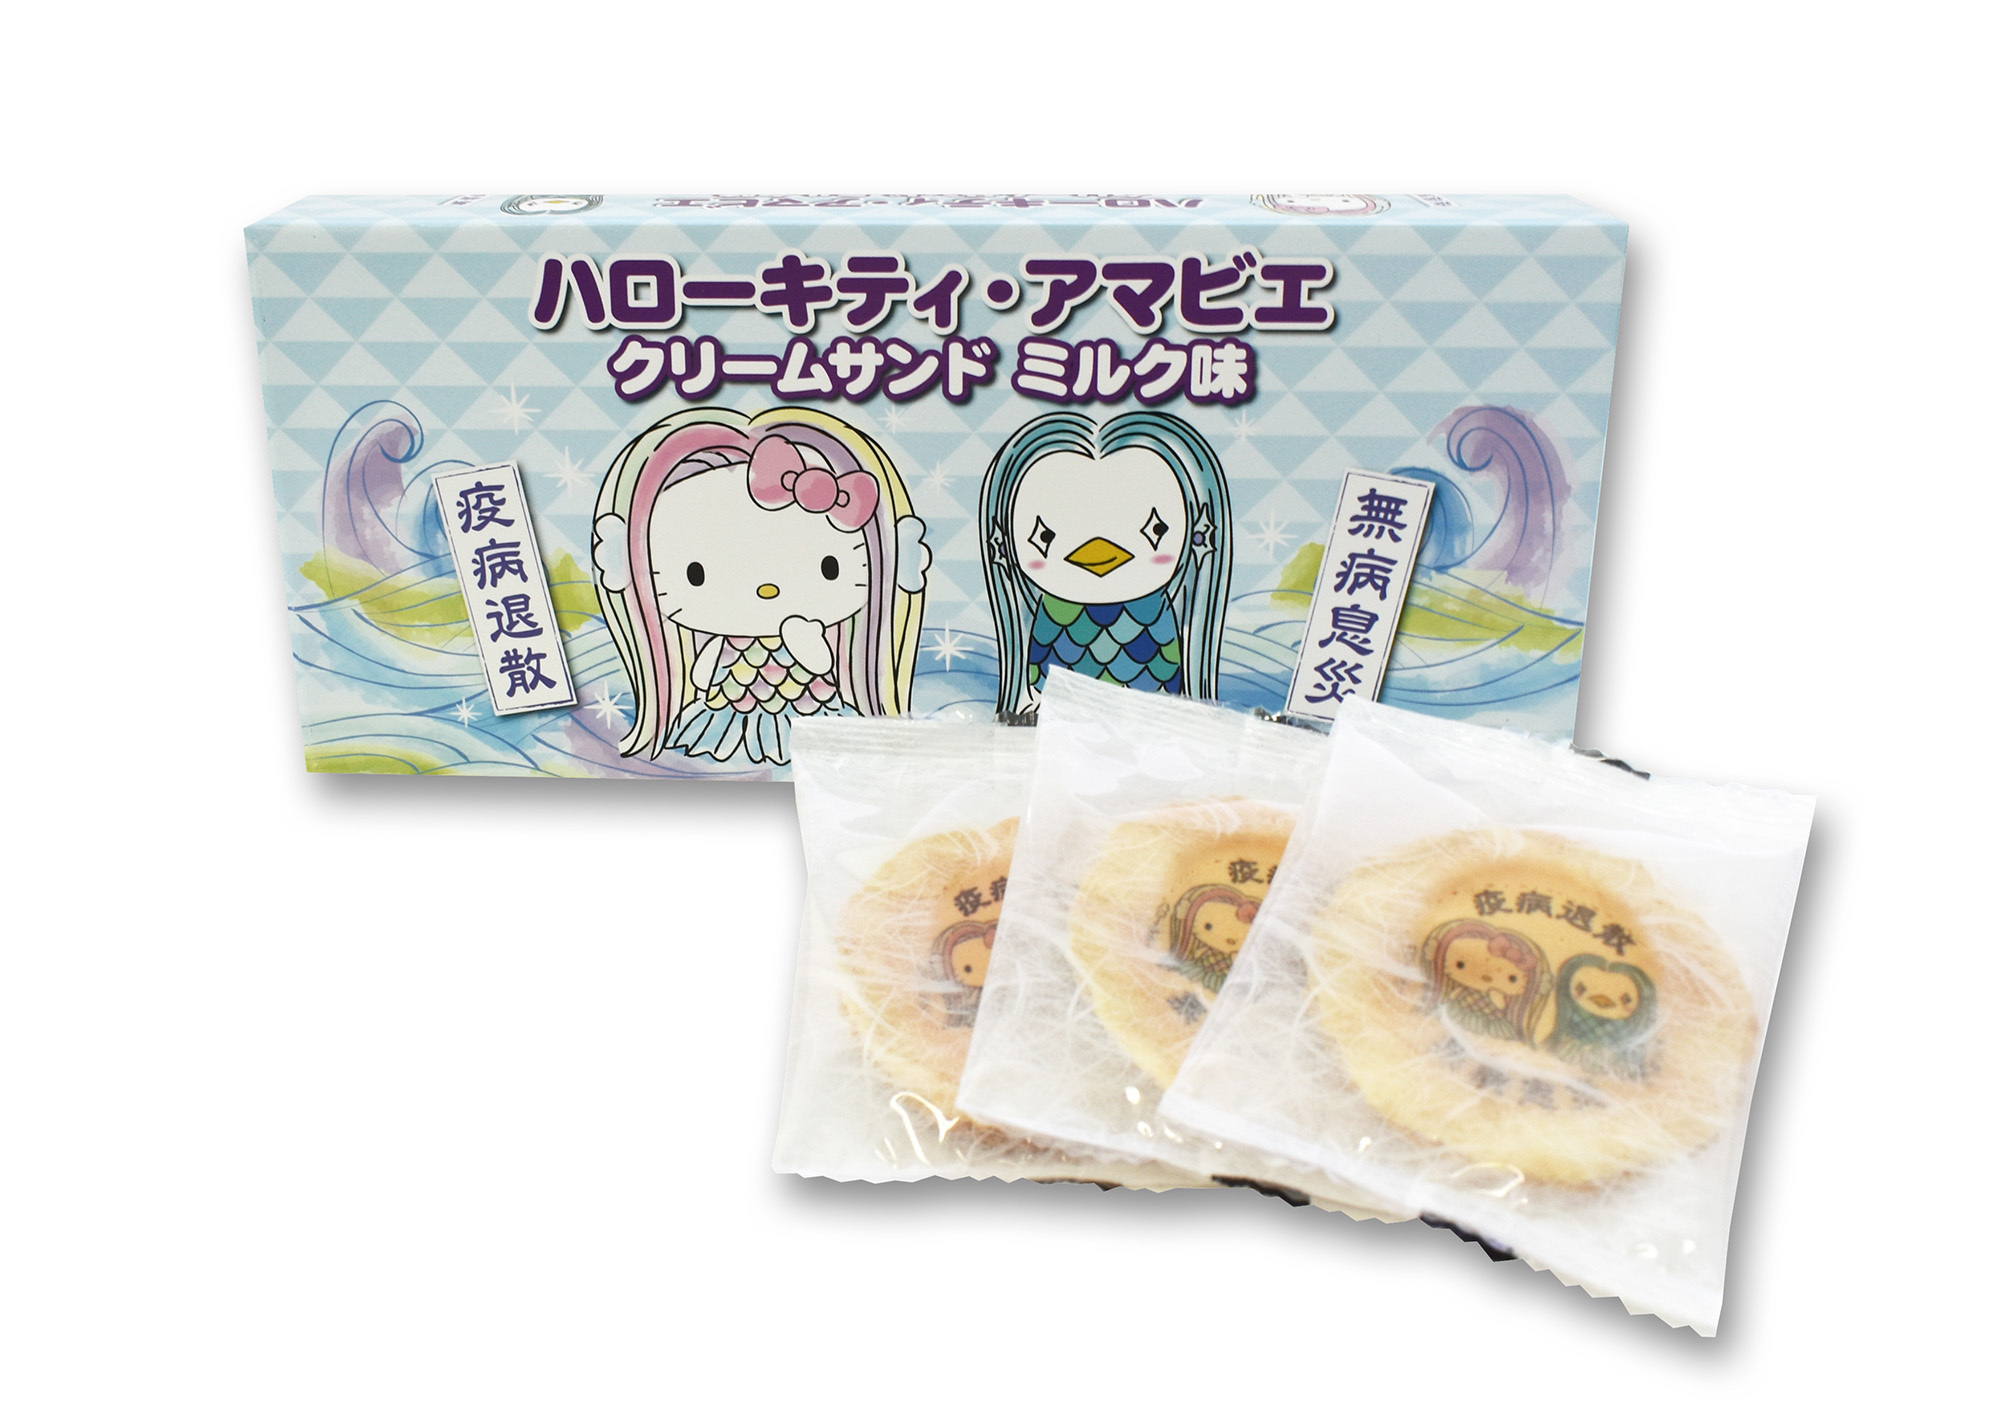 Hello Kitty_阿玛比埃联动商品_和邪社05